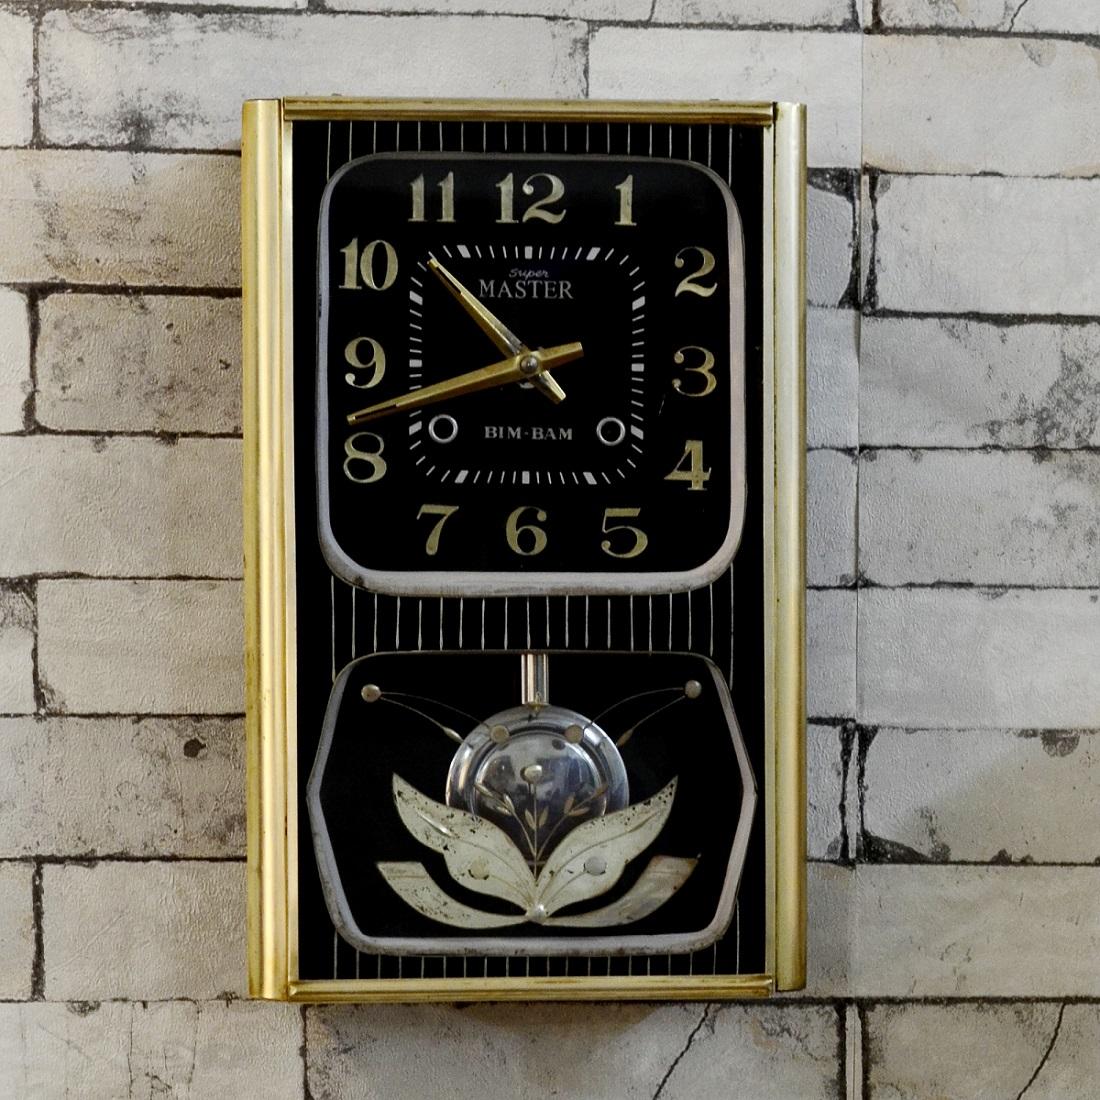 Old master bim bam pendulum antique wall clock antikcart pendulum antique wall clock sale hover to zoom amipublicfo Images